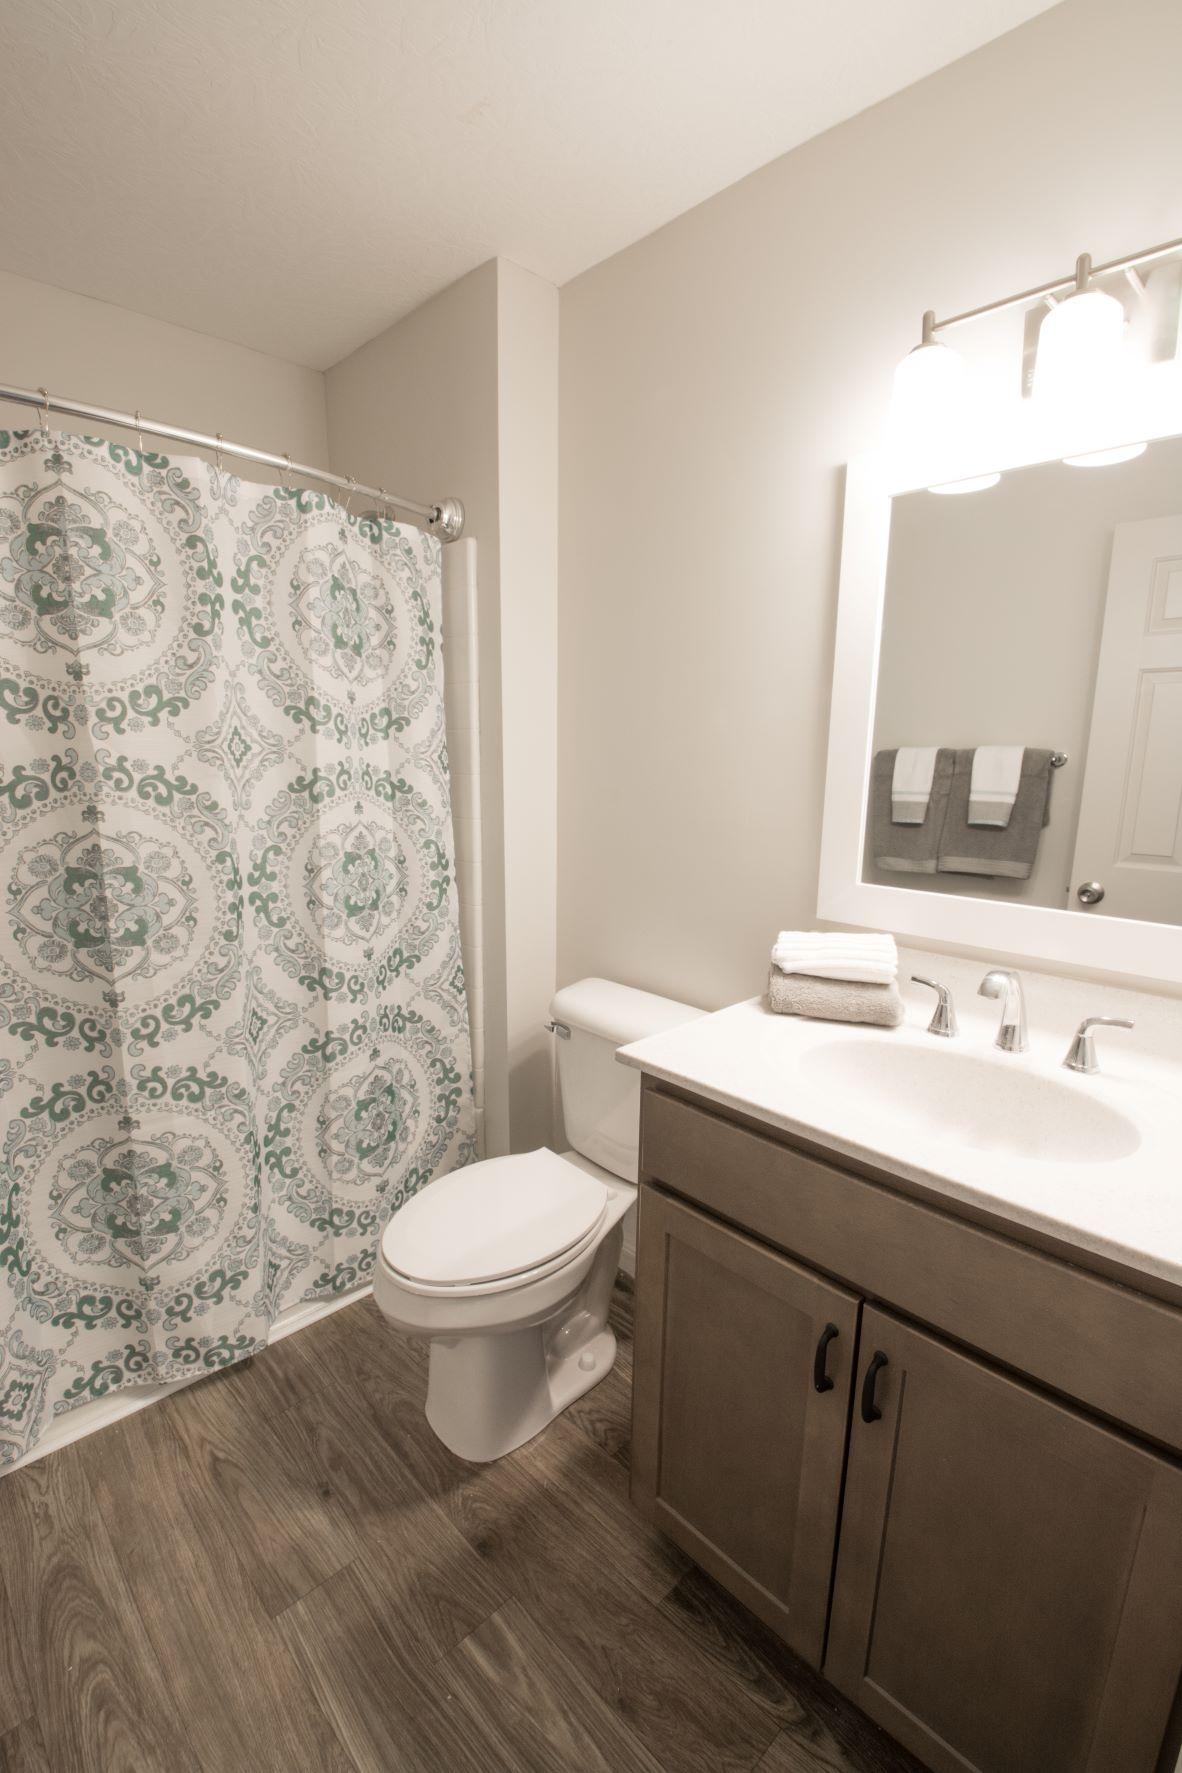 Shower and Bathtub Combination at Stone Bridge Apartments in Mason, Ohio